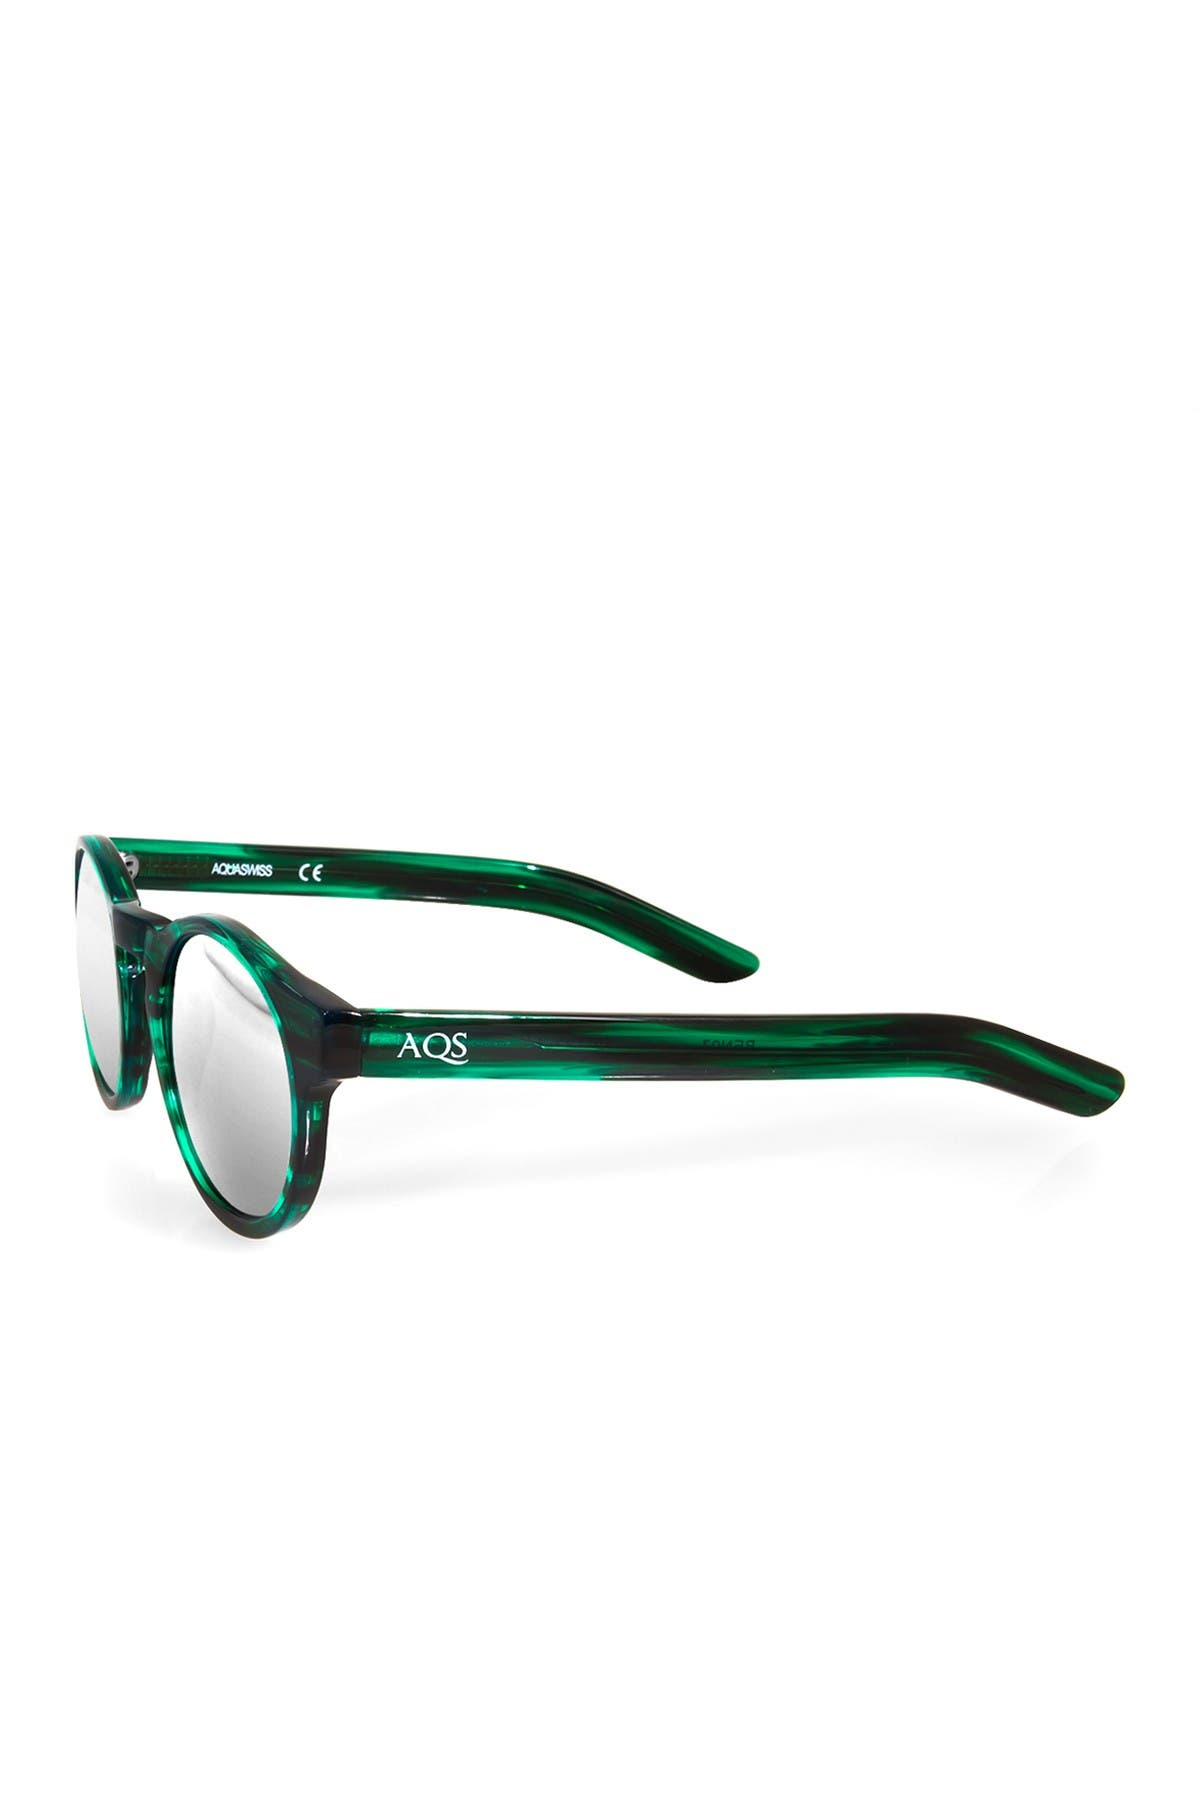 Image of AQS Benni 49mm Green Acetate Sunglasses